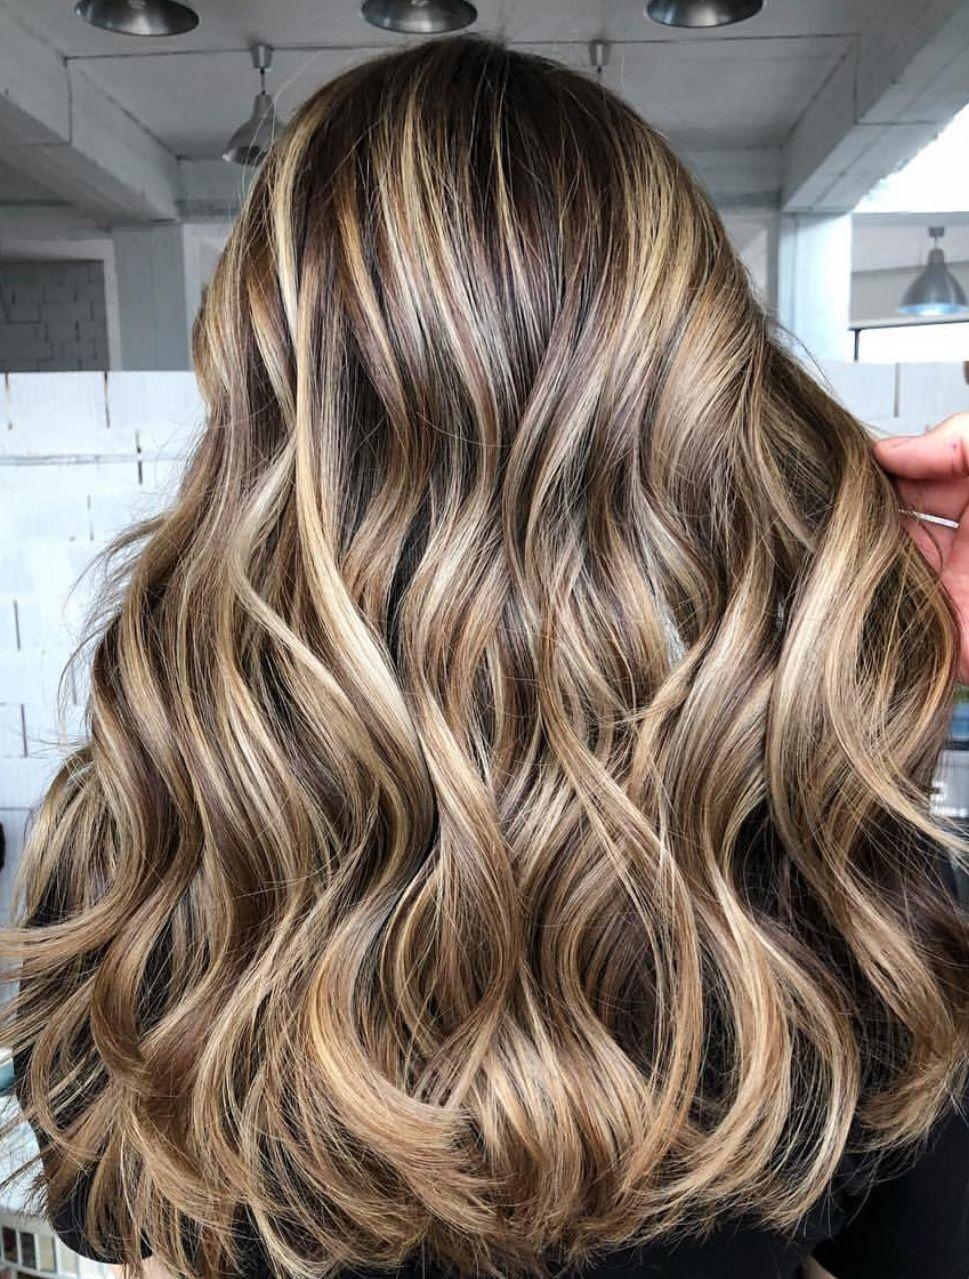 Hair Inspiration 2019-05-09 16:57:53